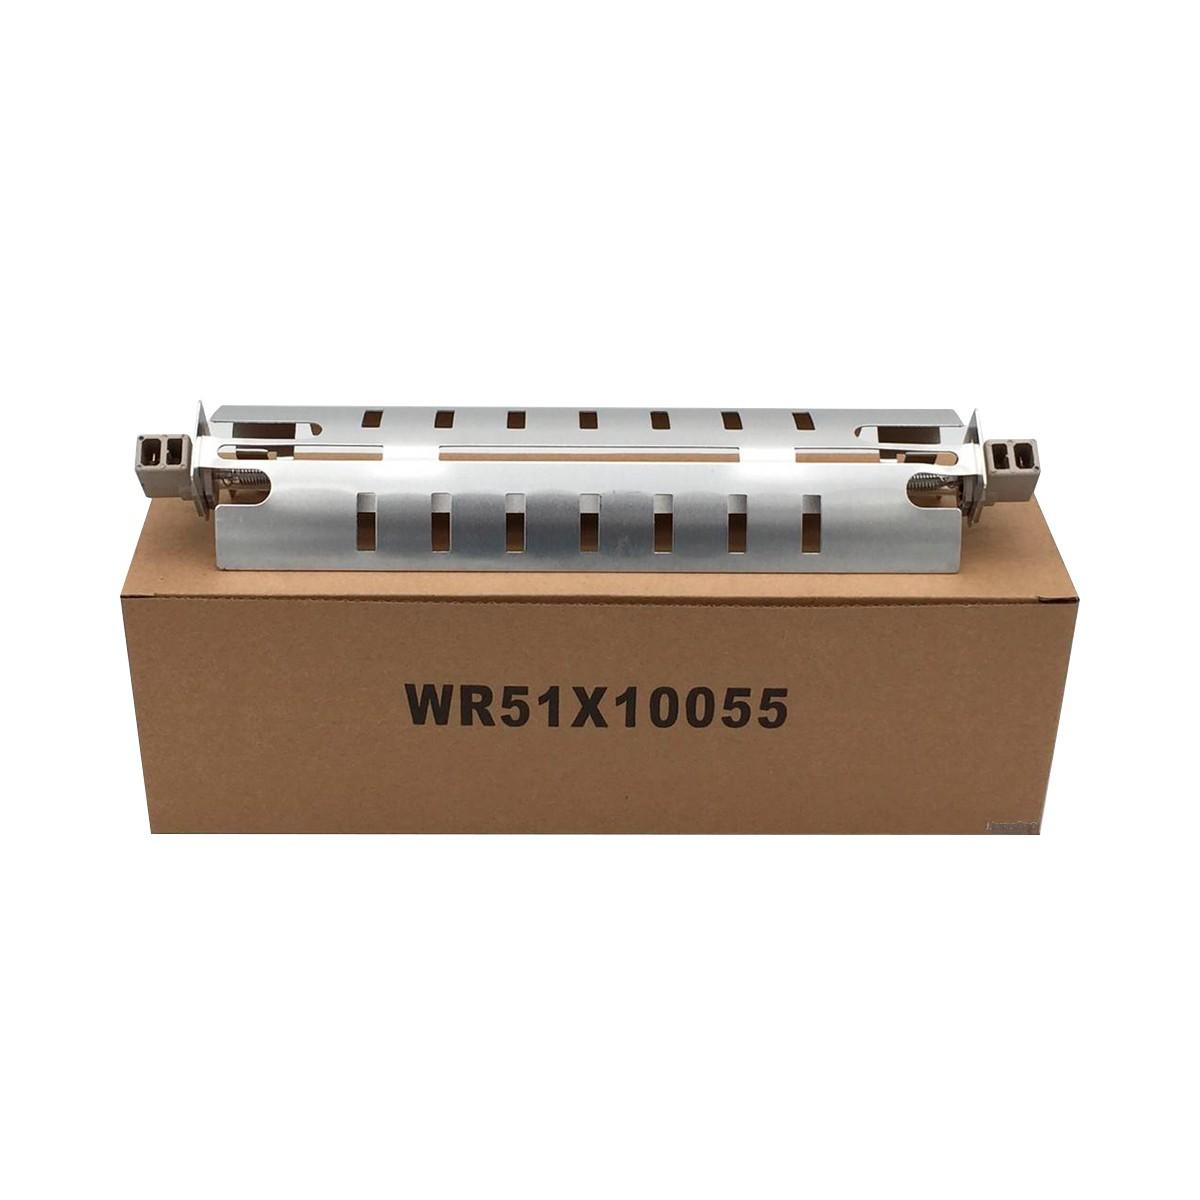 Resistencia Refrigerado Ge Side By Side Wr51x10055 31cm 127